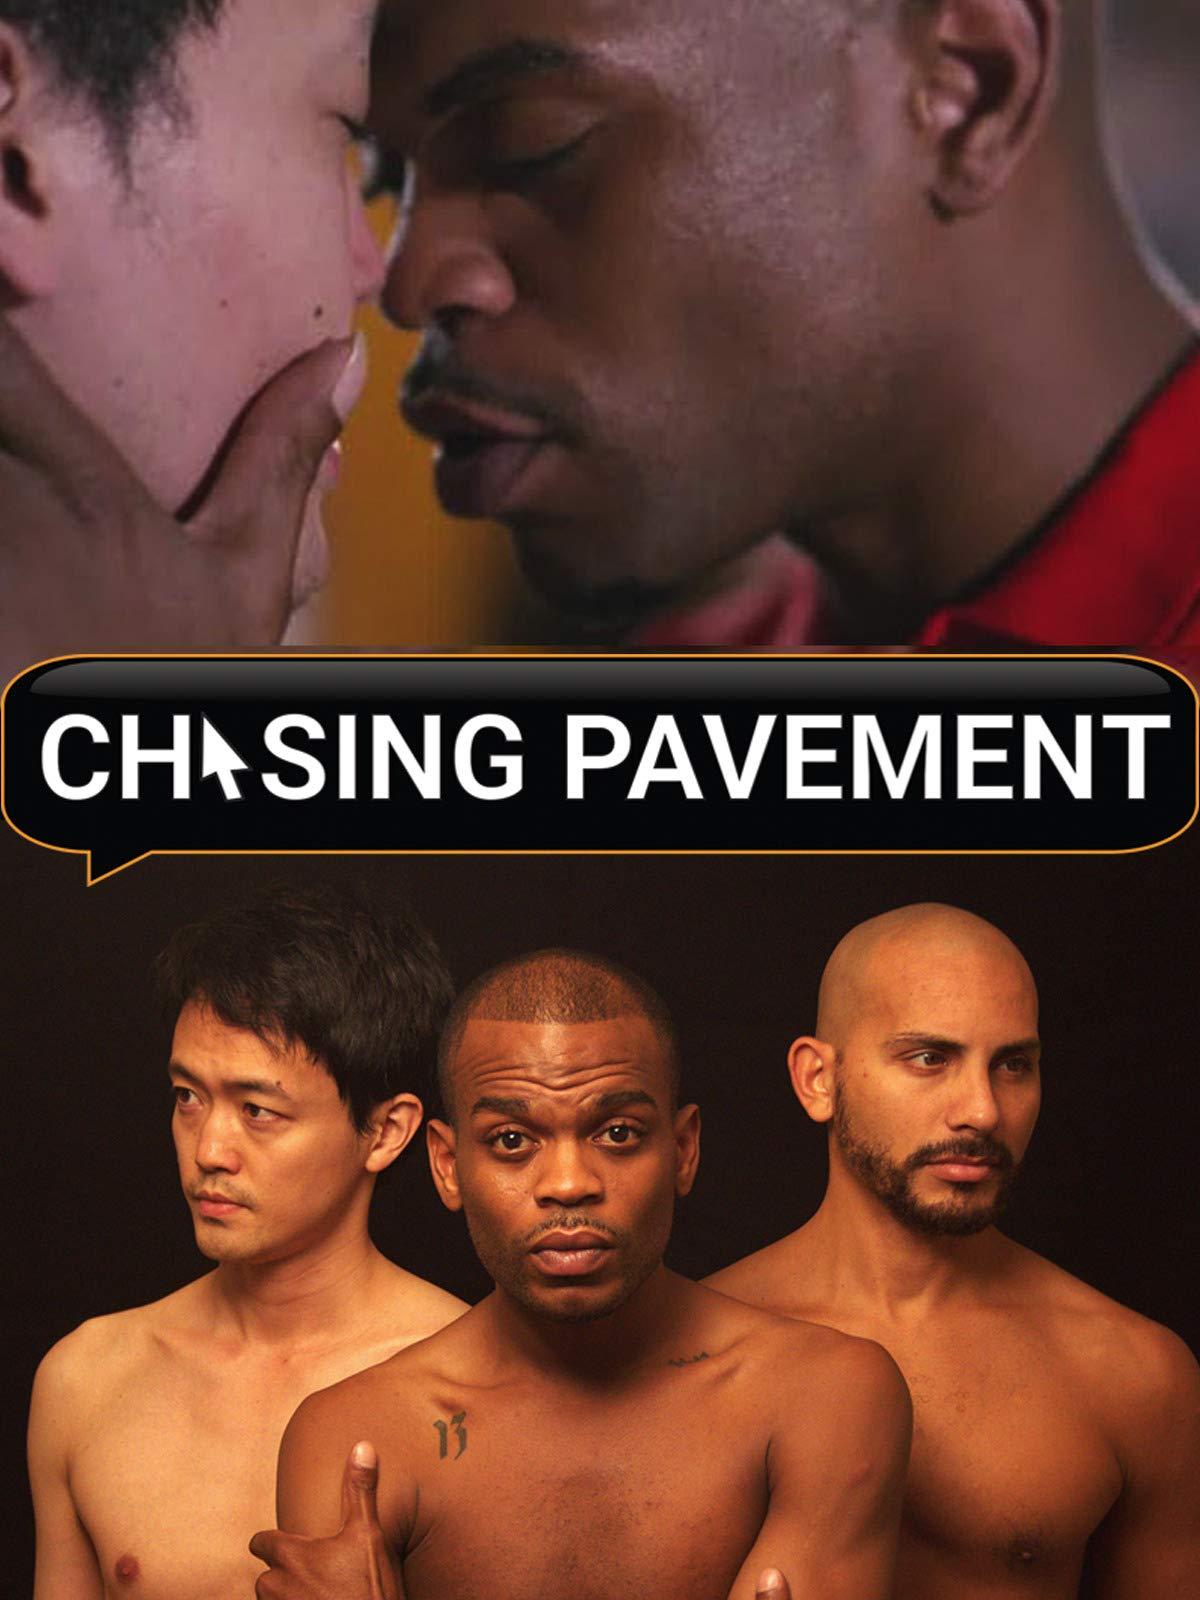 chasing pavements free download